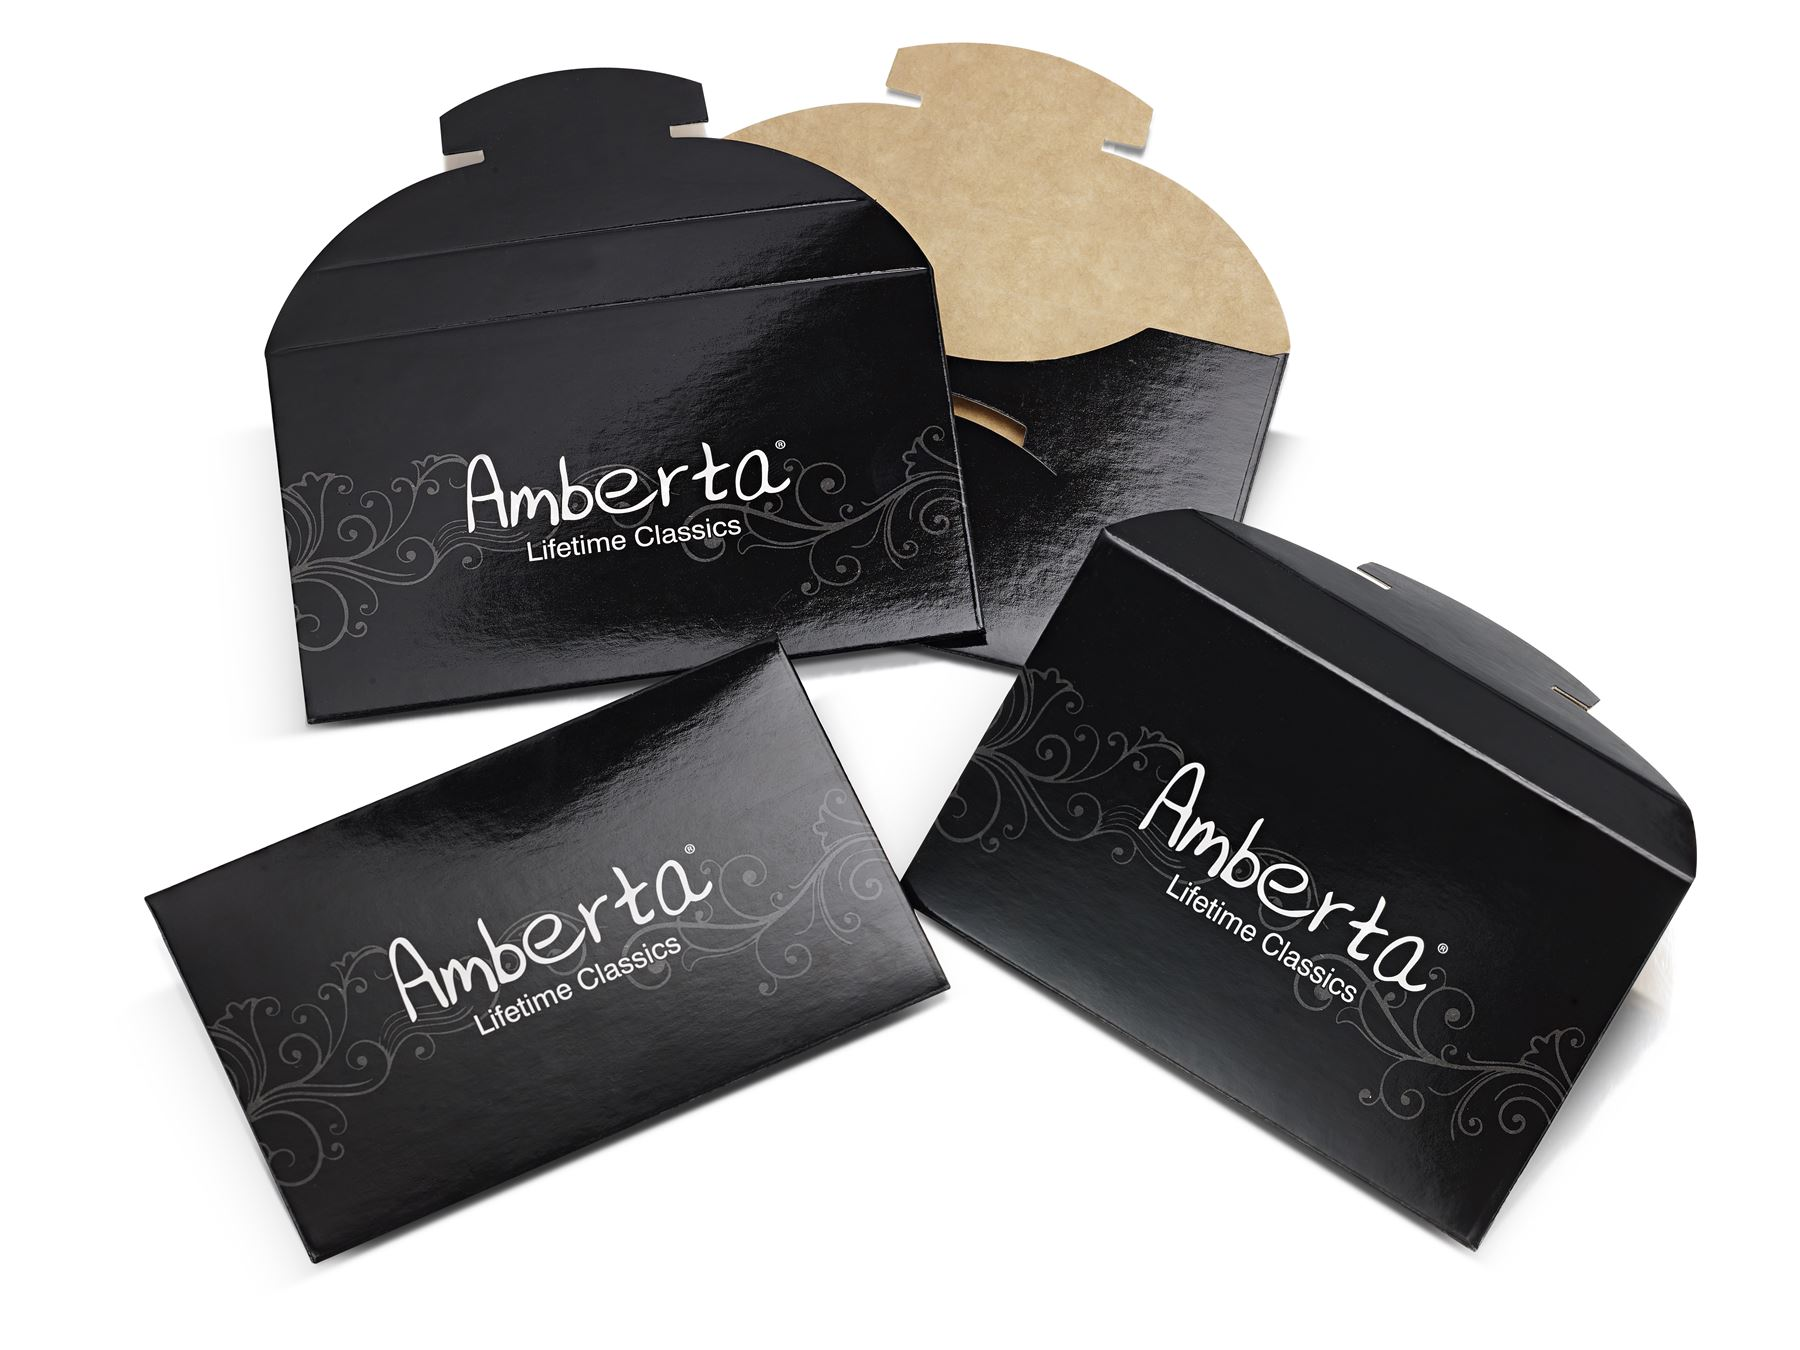 Amberta-Jewelry-925-Sterling-Silver-Adjustable-Bracelet-Italian-Bangle-for-Women miniature 34